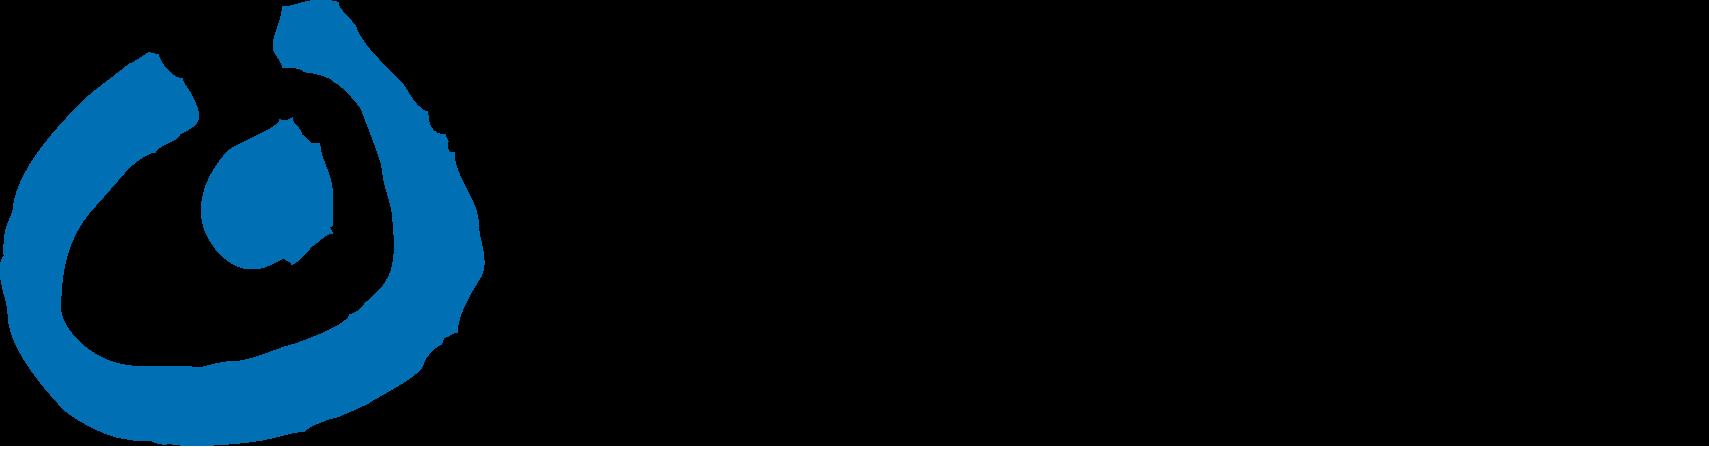 Logo des Sponsors: Lebenshilfe Köln